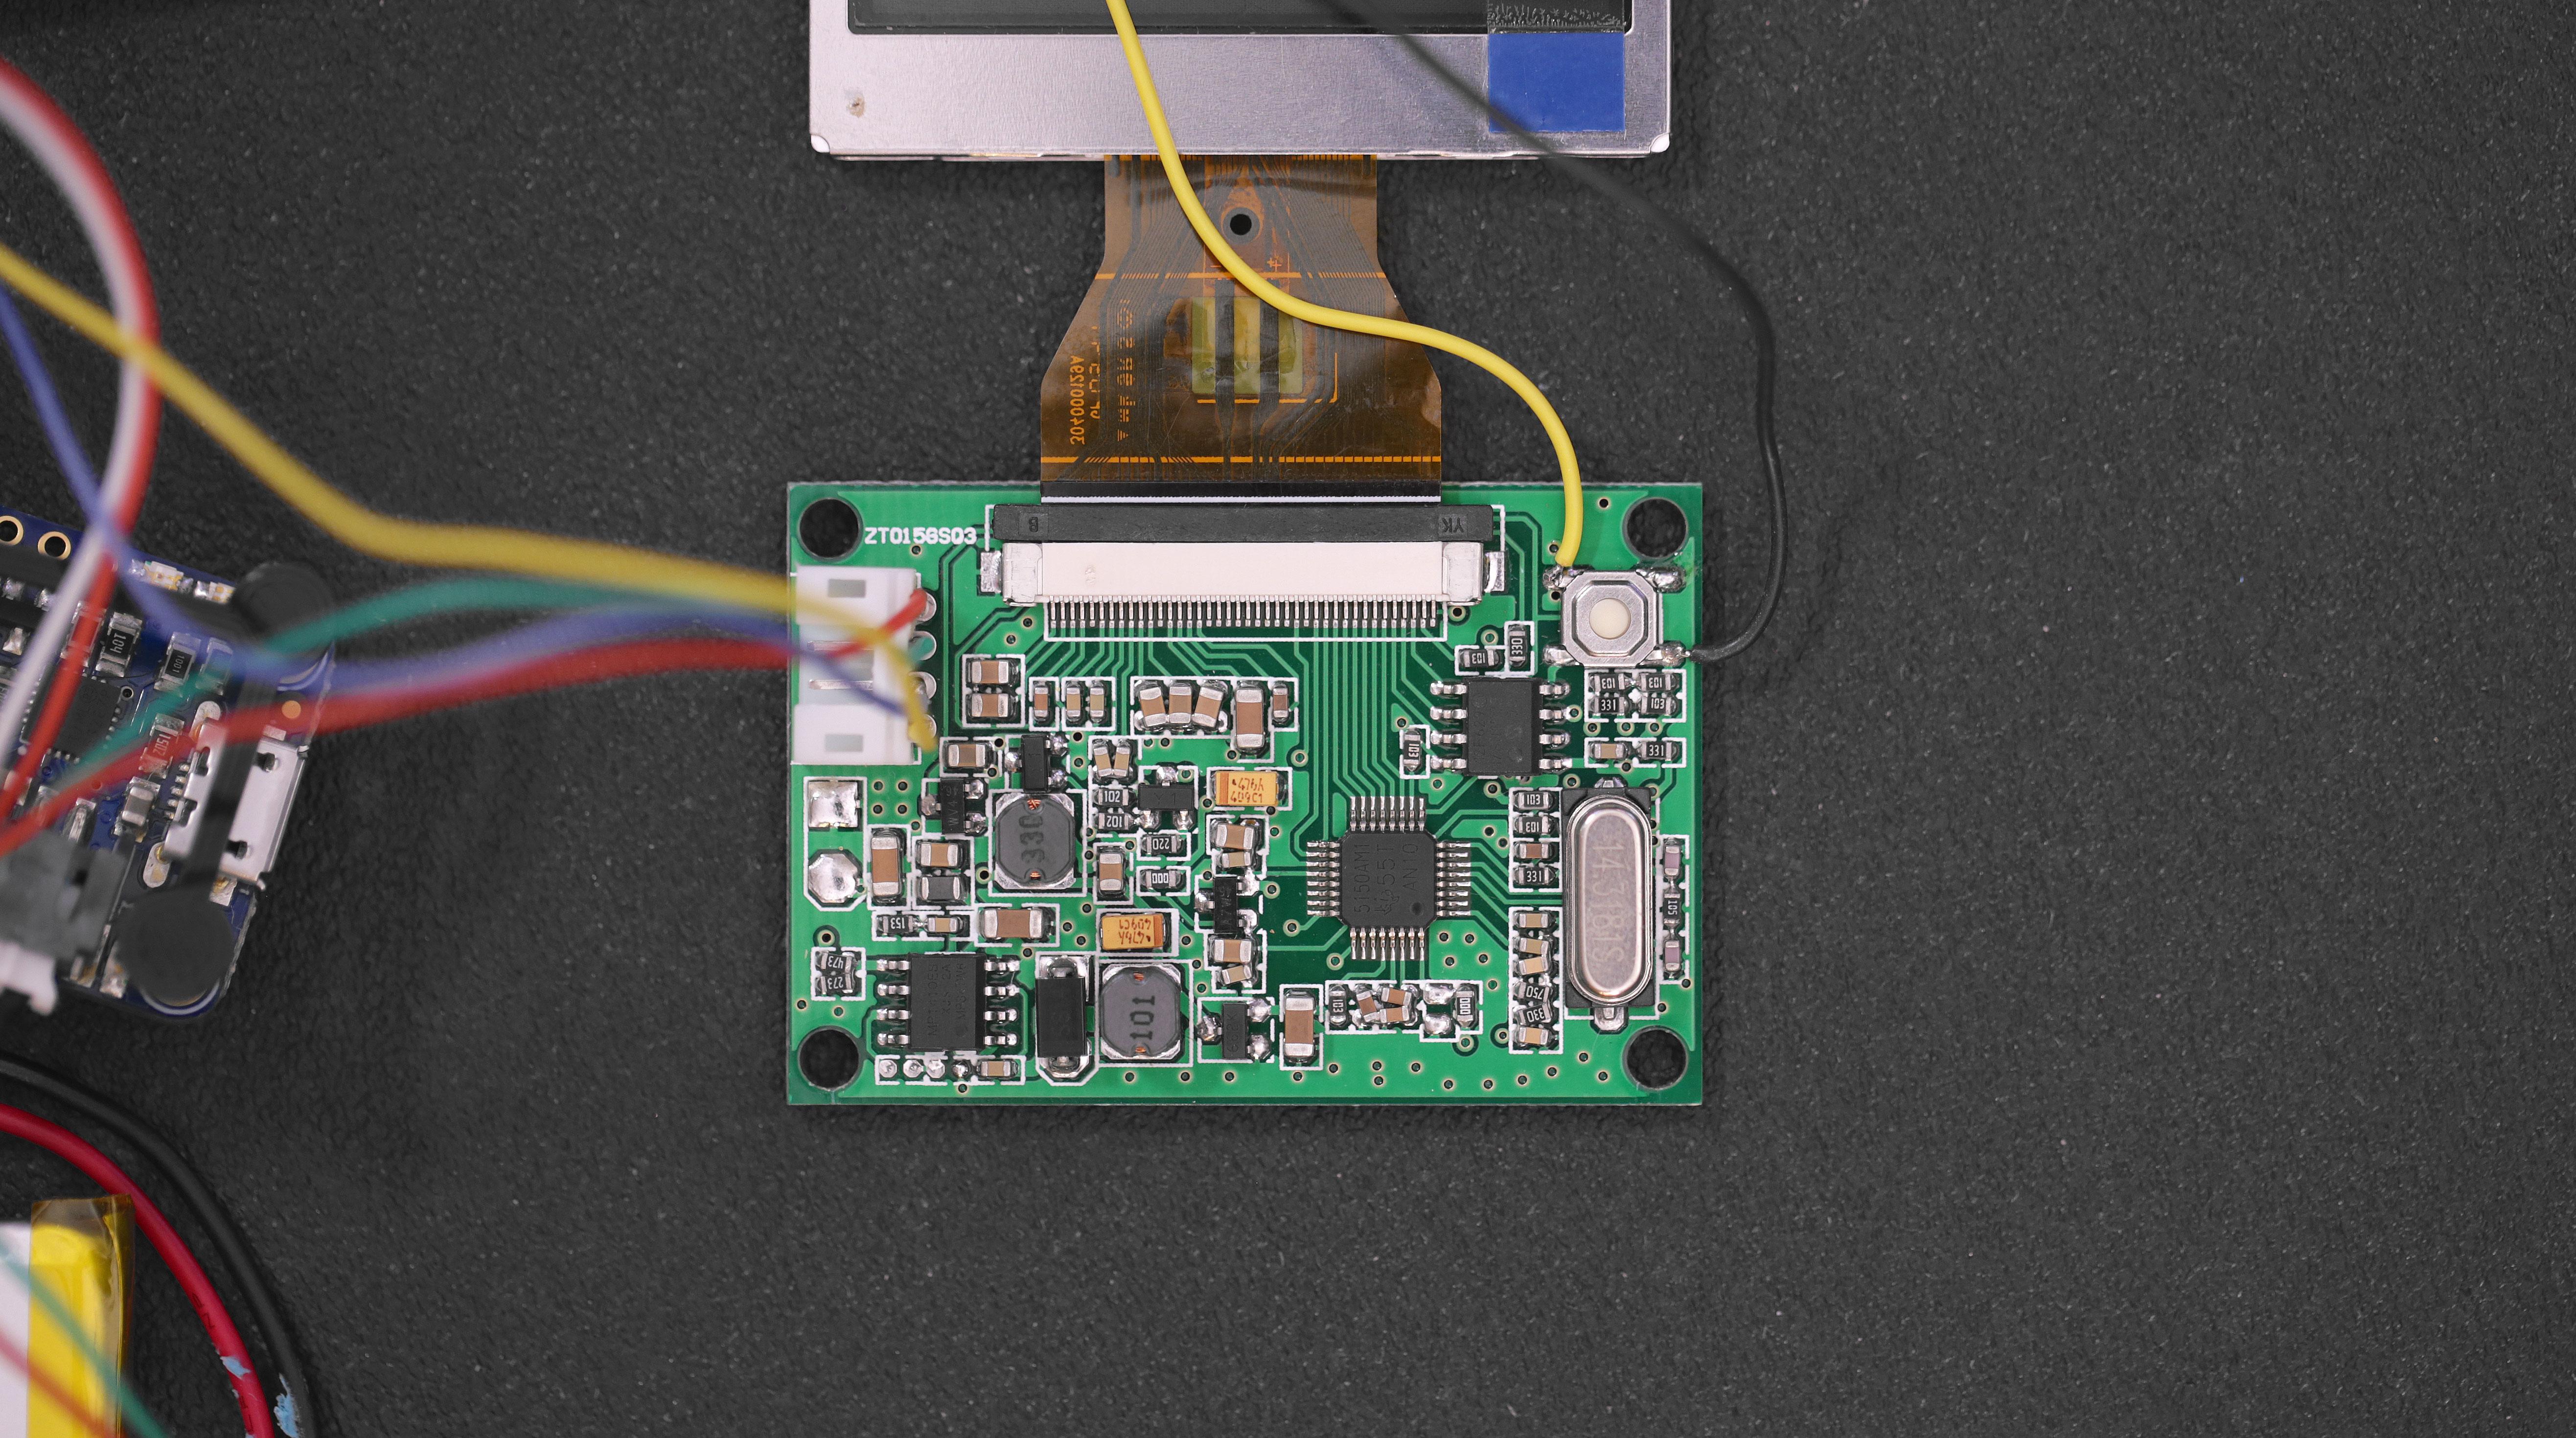 lcds___displays_brightness-button-solder.jpg